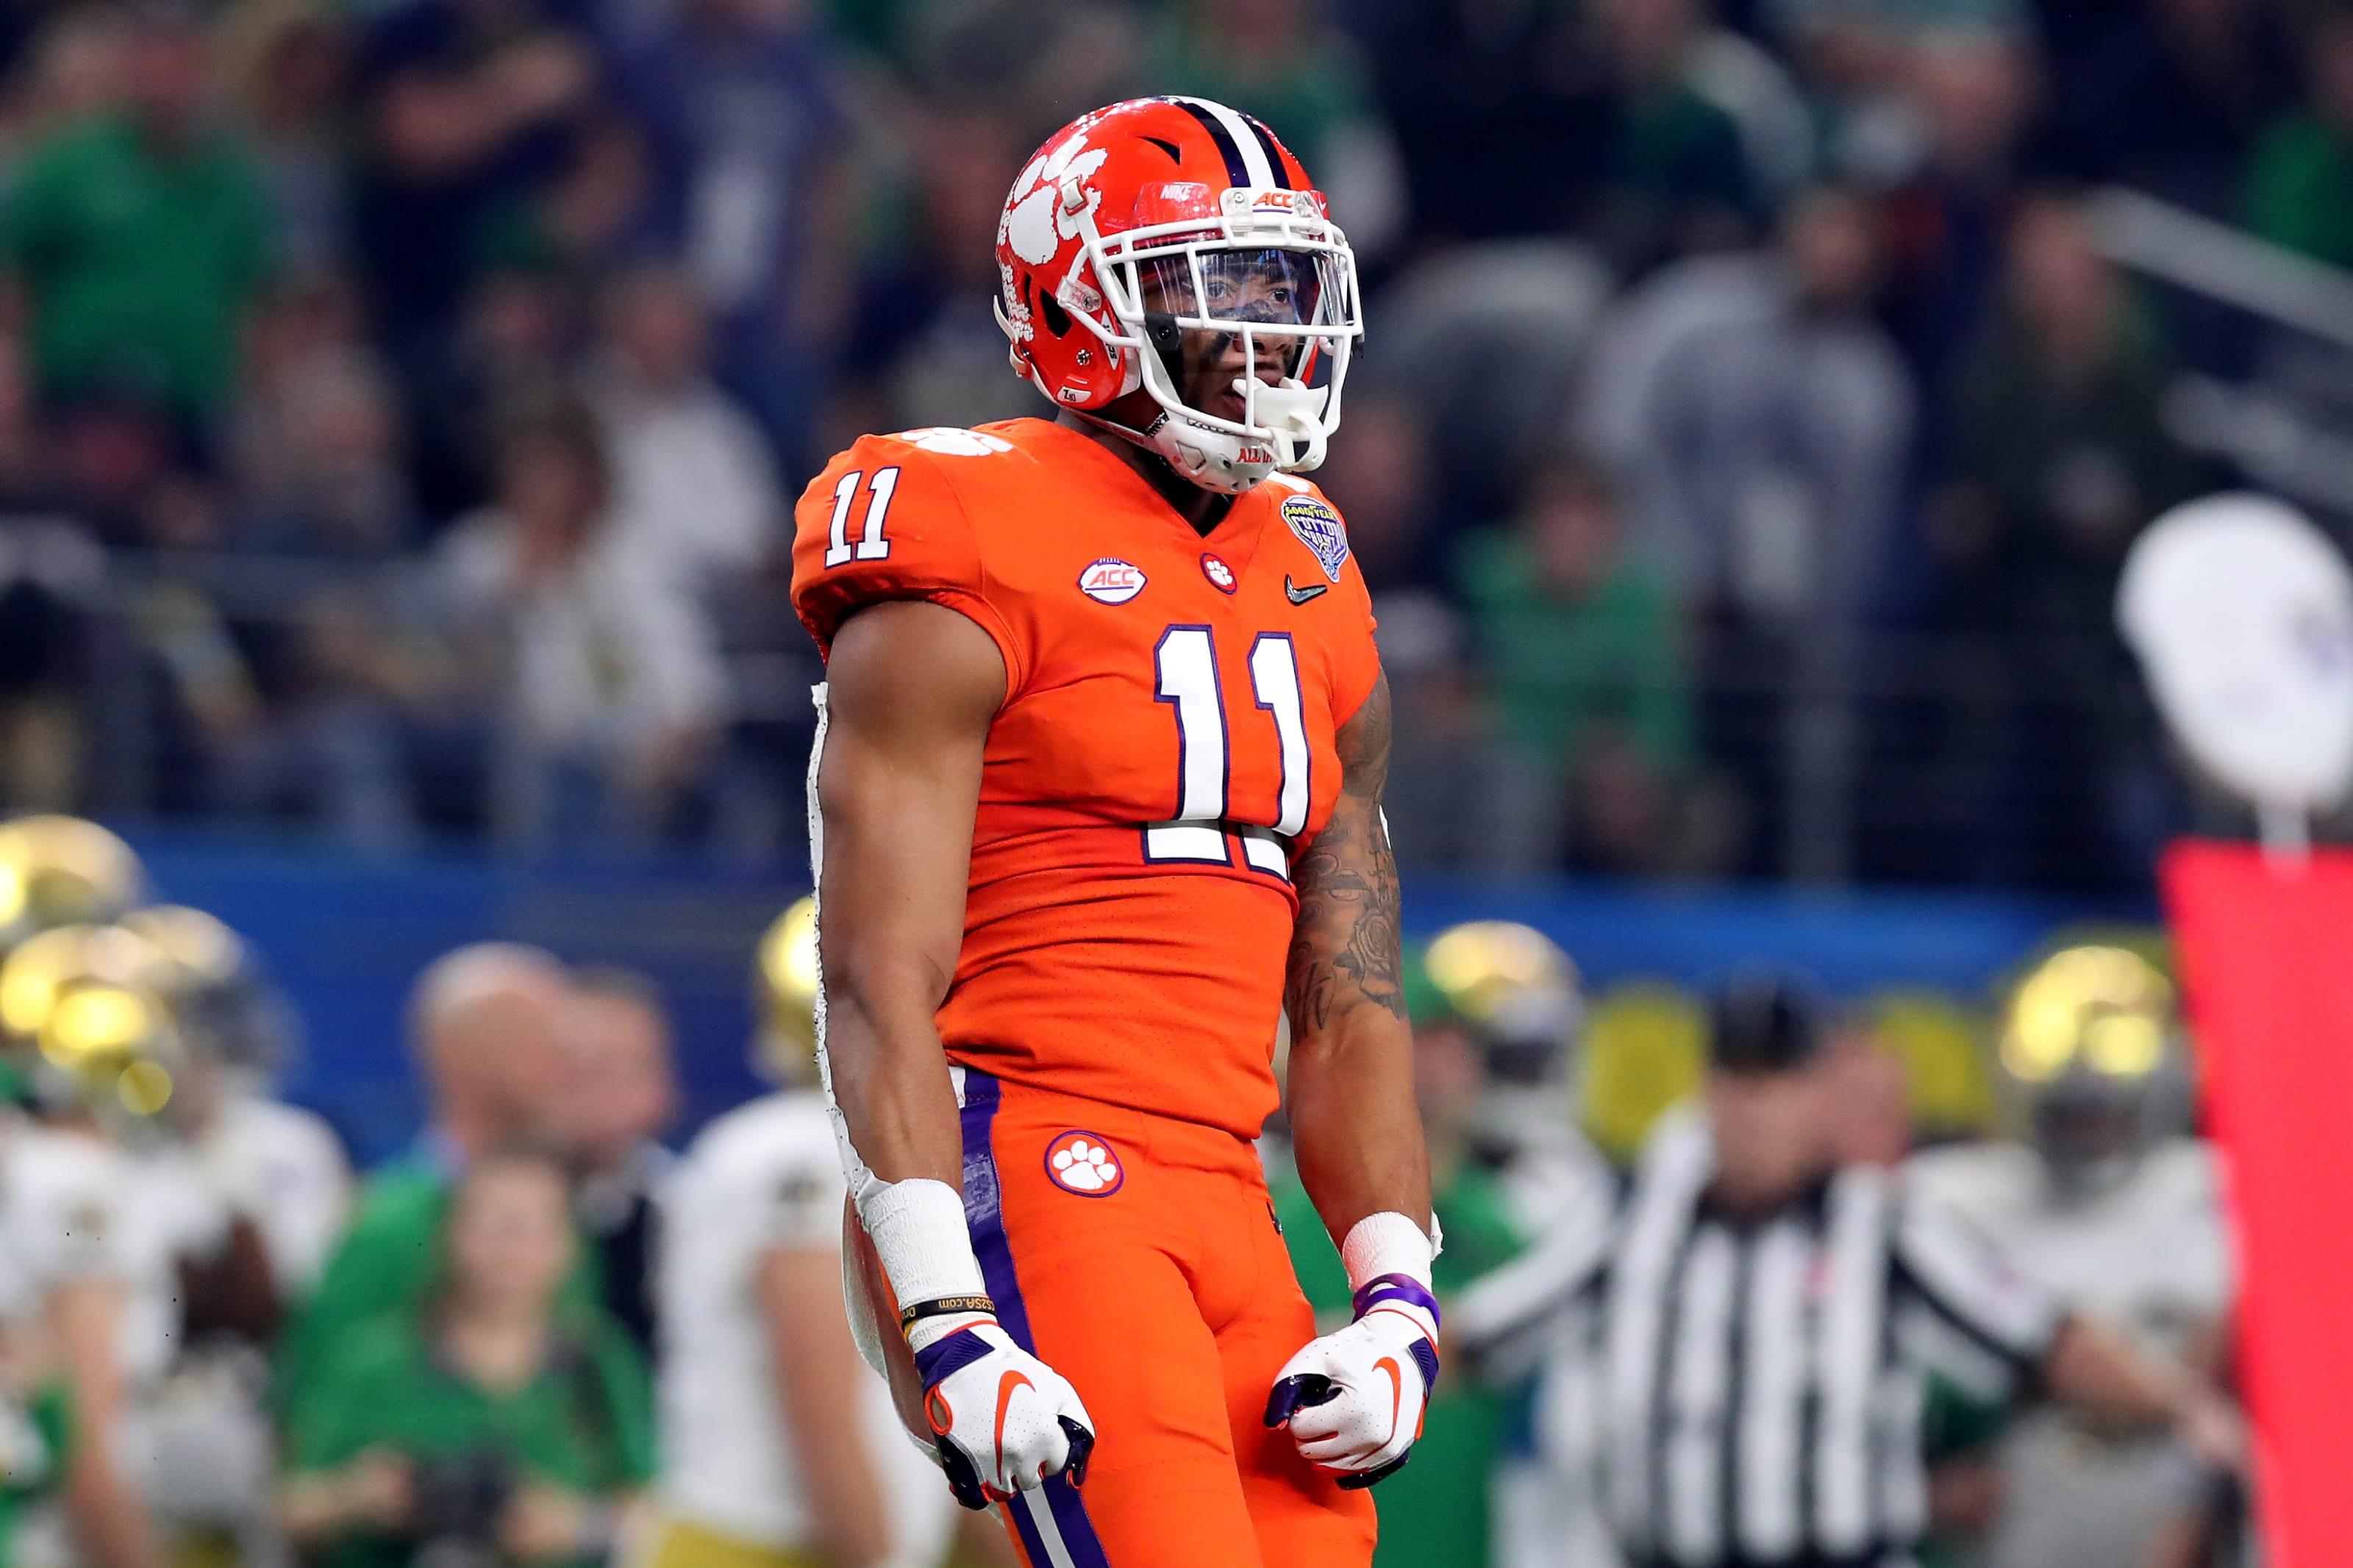 Isaiah Simmons 2020 NFL Draft